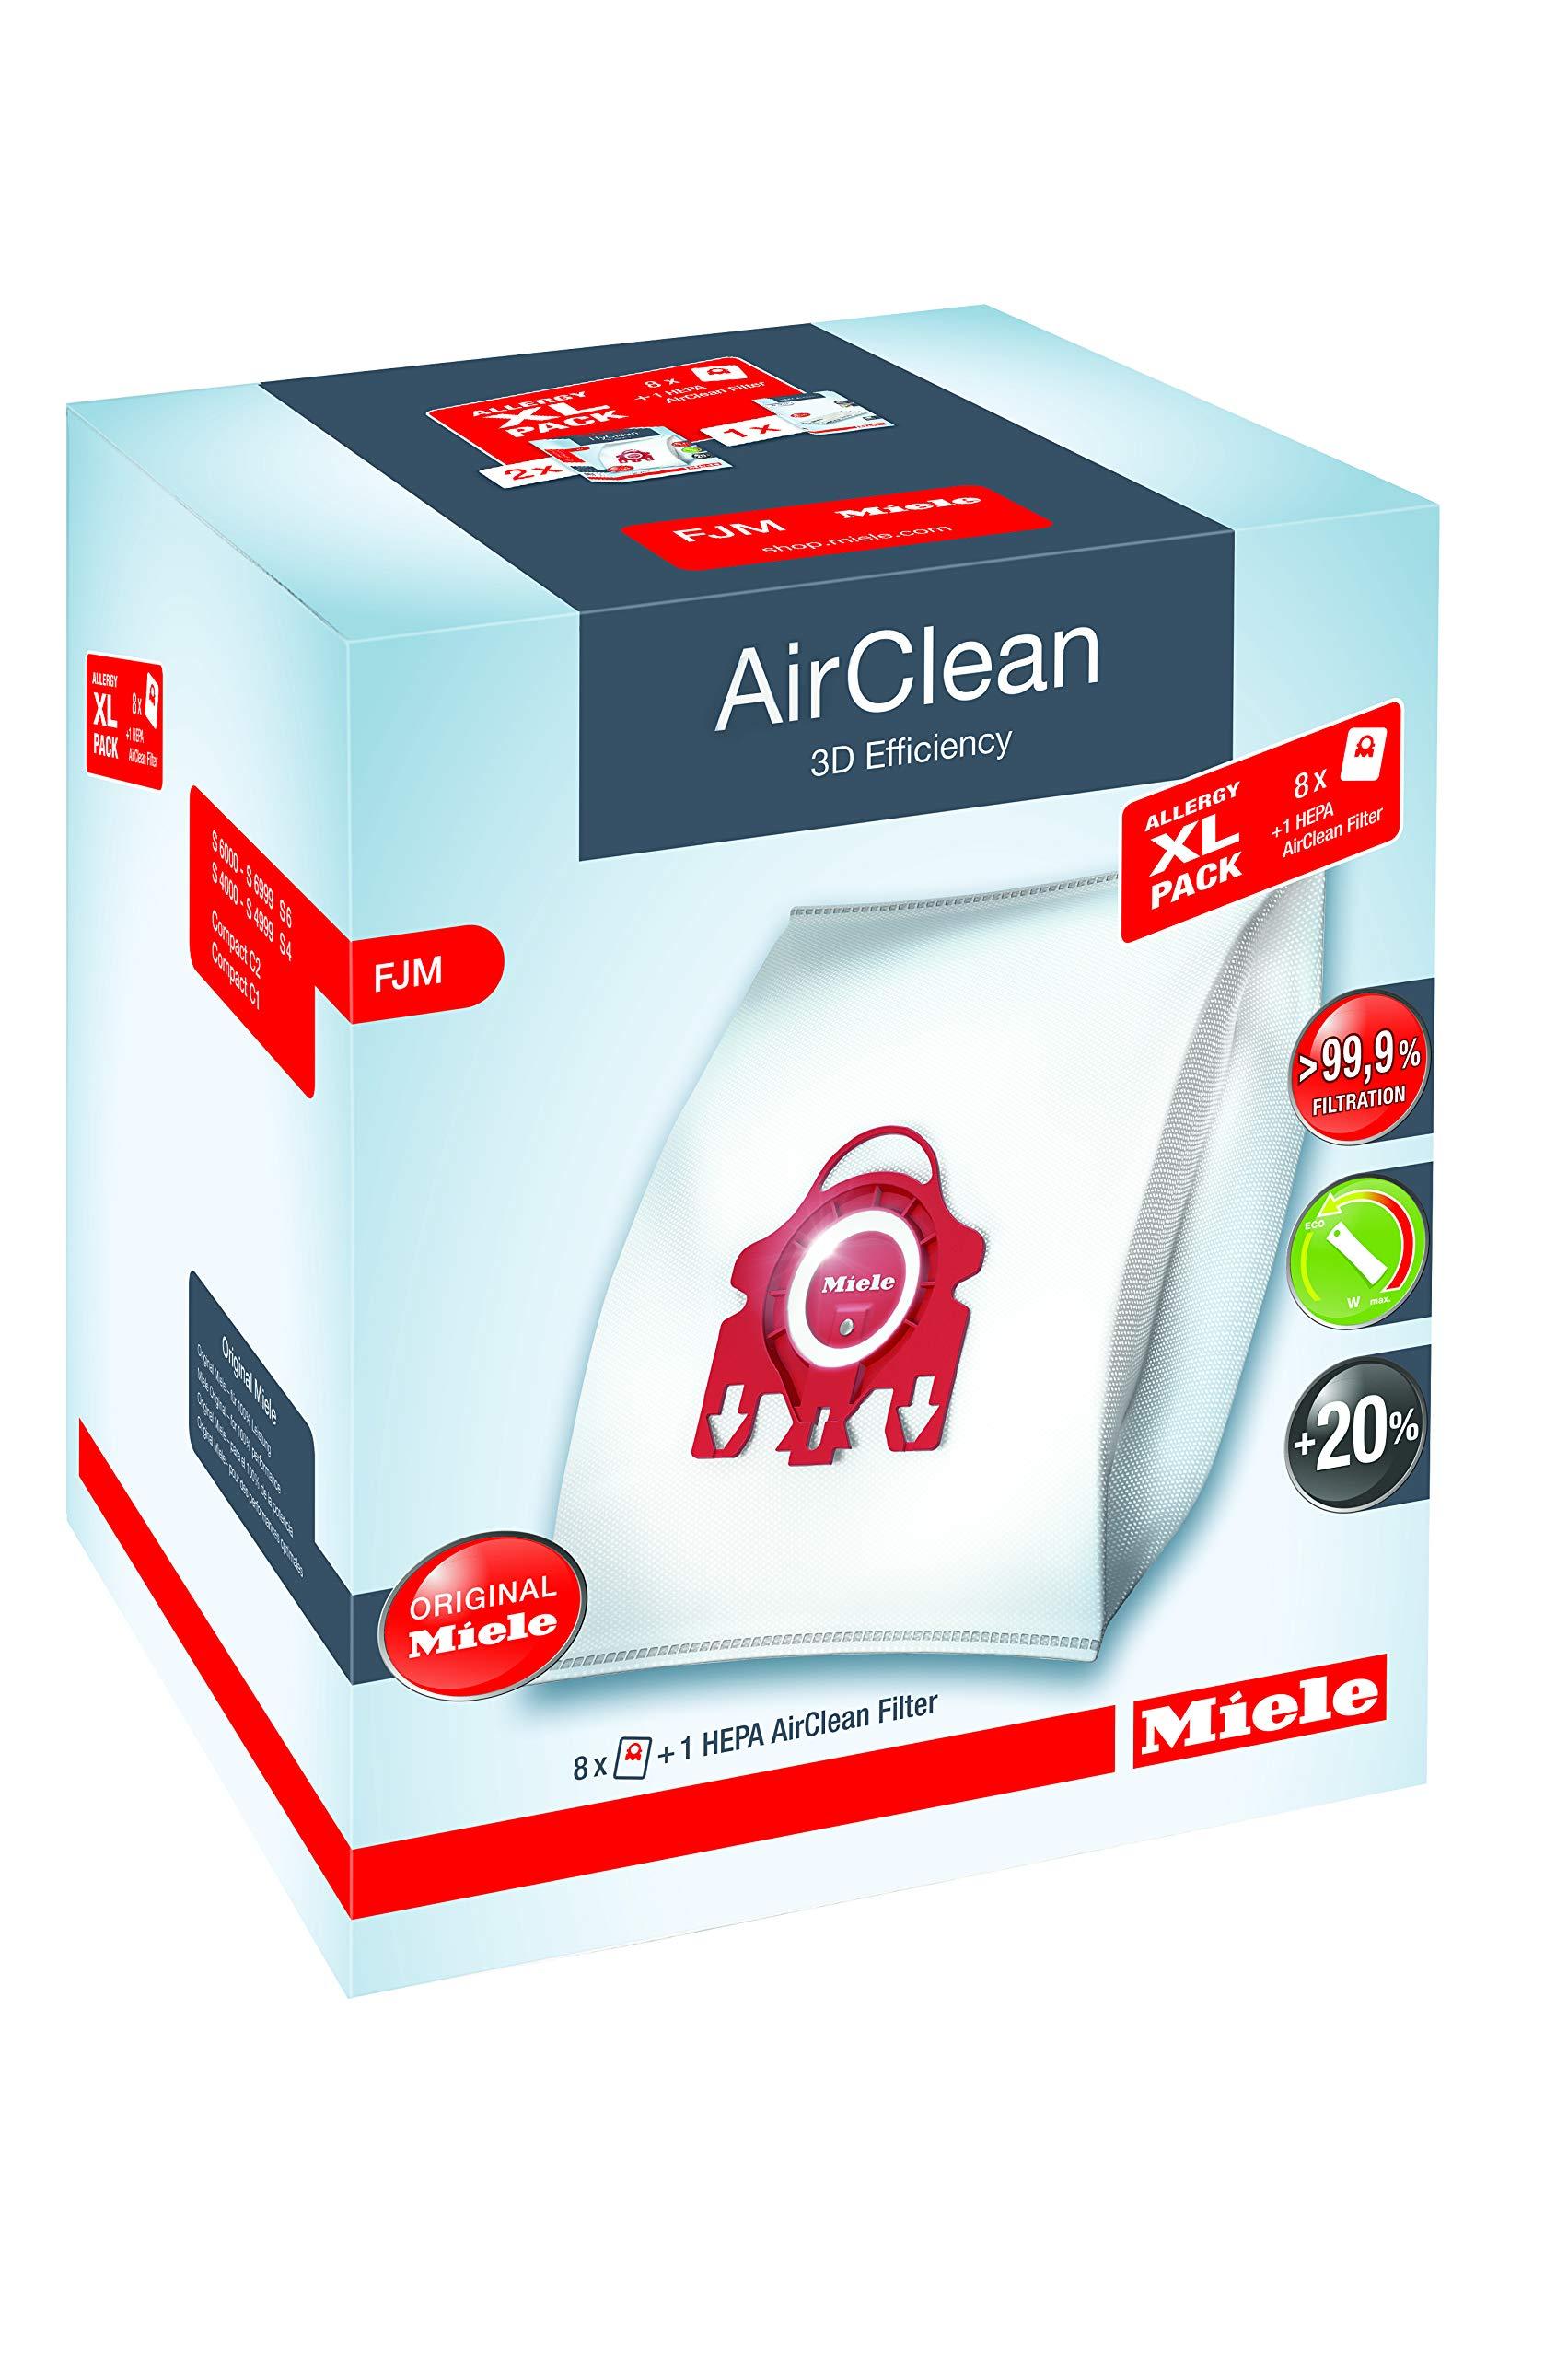 Miele AirClean 3D Allergy XL-Pack, FJM FilterBags Vacuum Bag, White by Miele